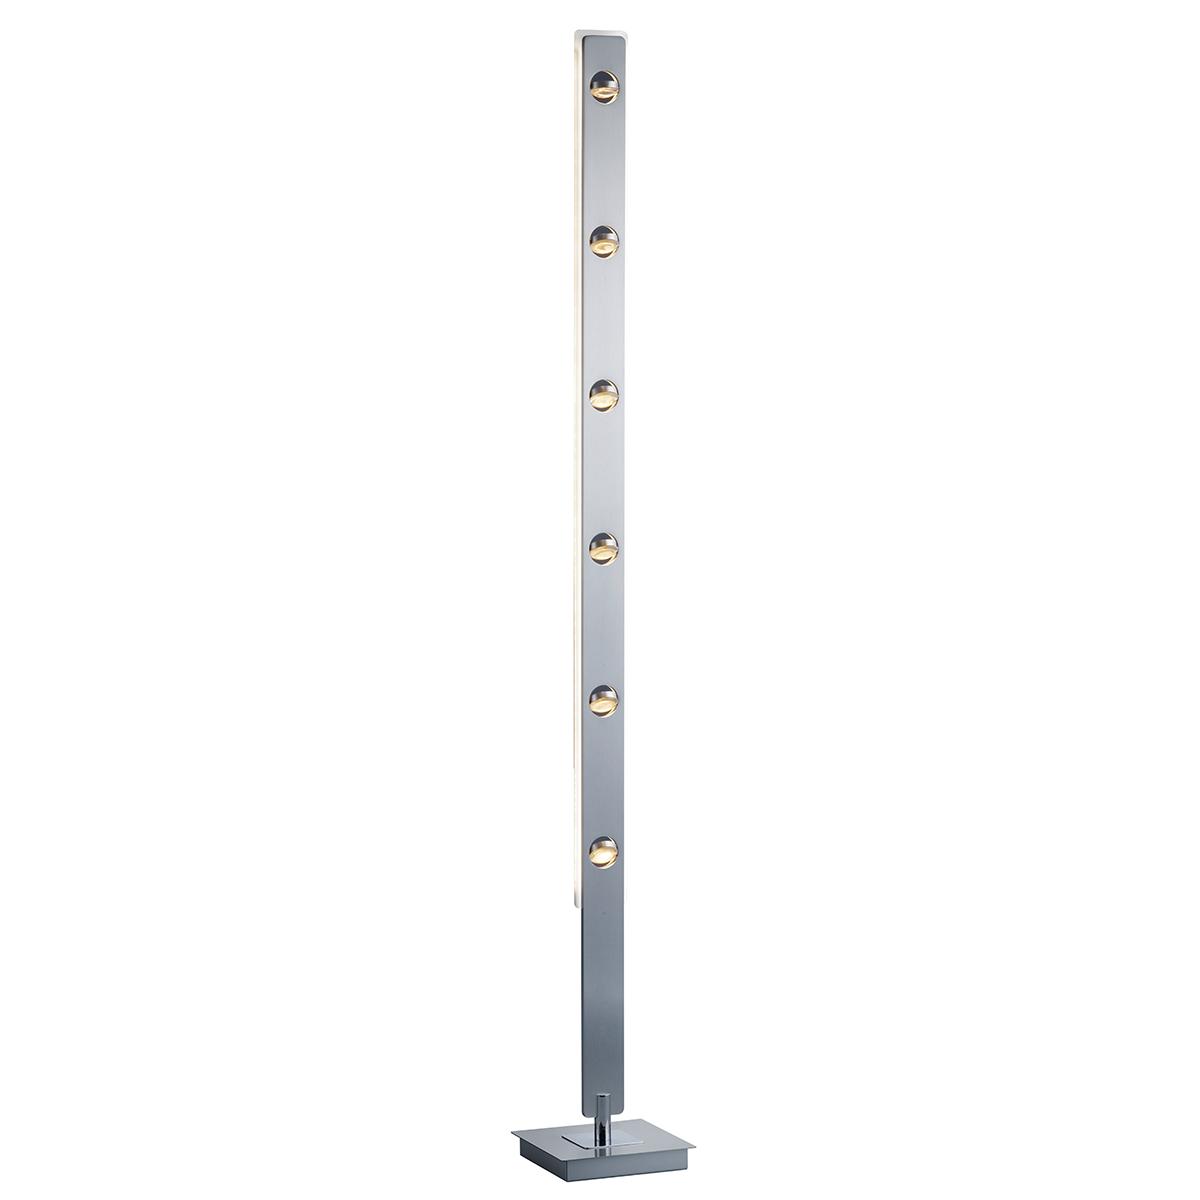 Bankamp Caro LED Stehleuchte 6089/6-90